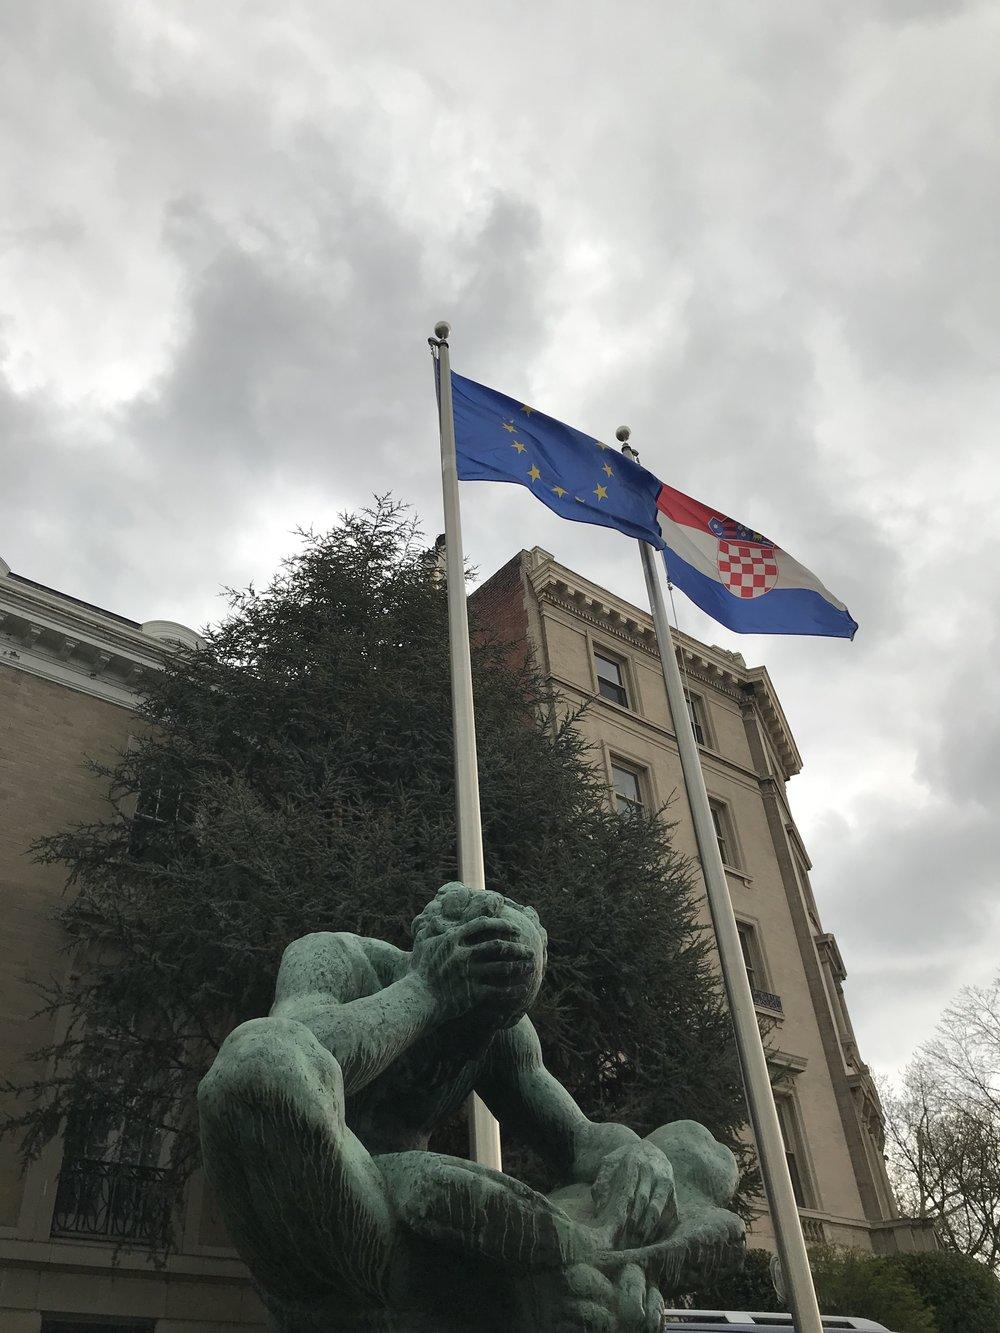 The Embassy of Croatia.